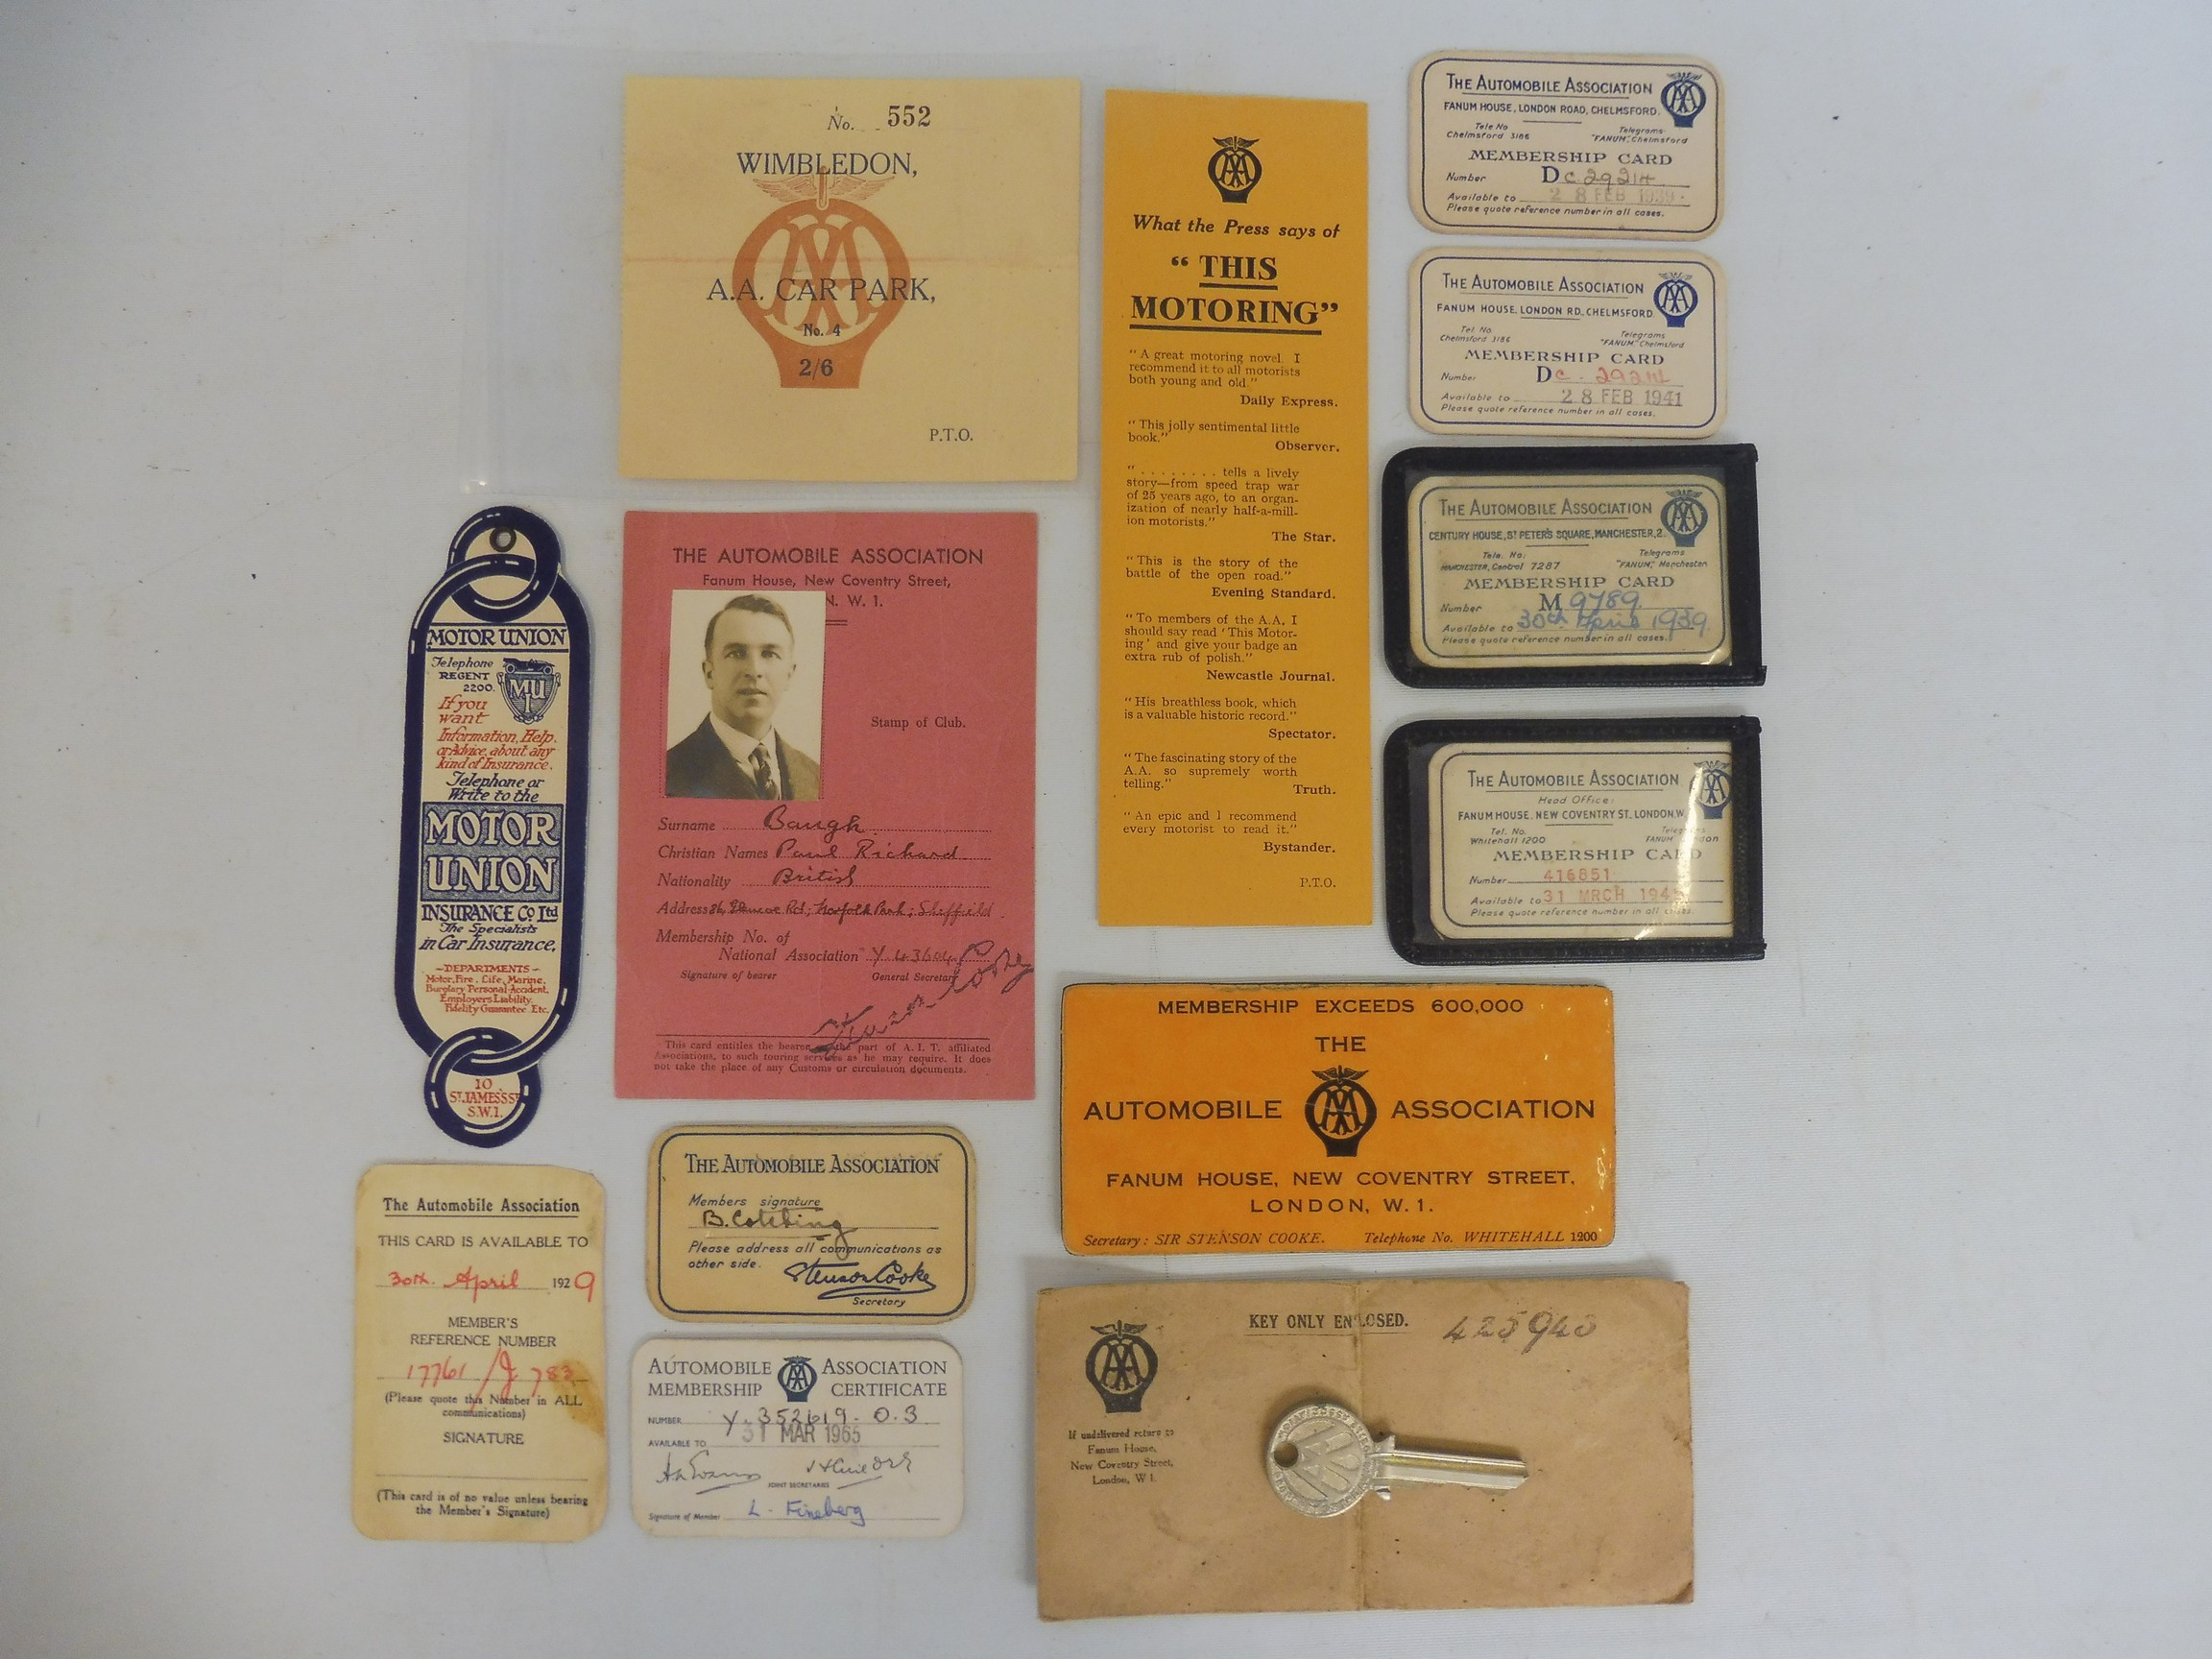 A small collection of AA ephemera including a Wimbledon AA Car Park ticket, membership tickets,